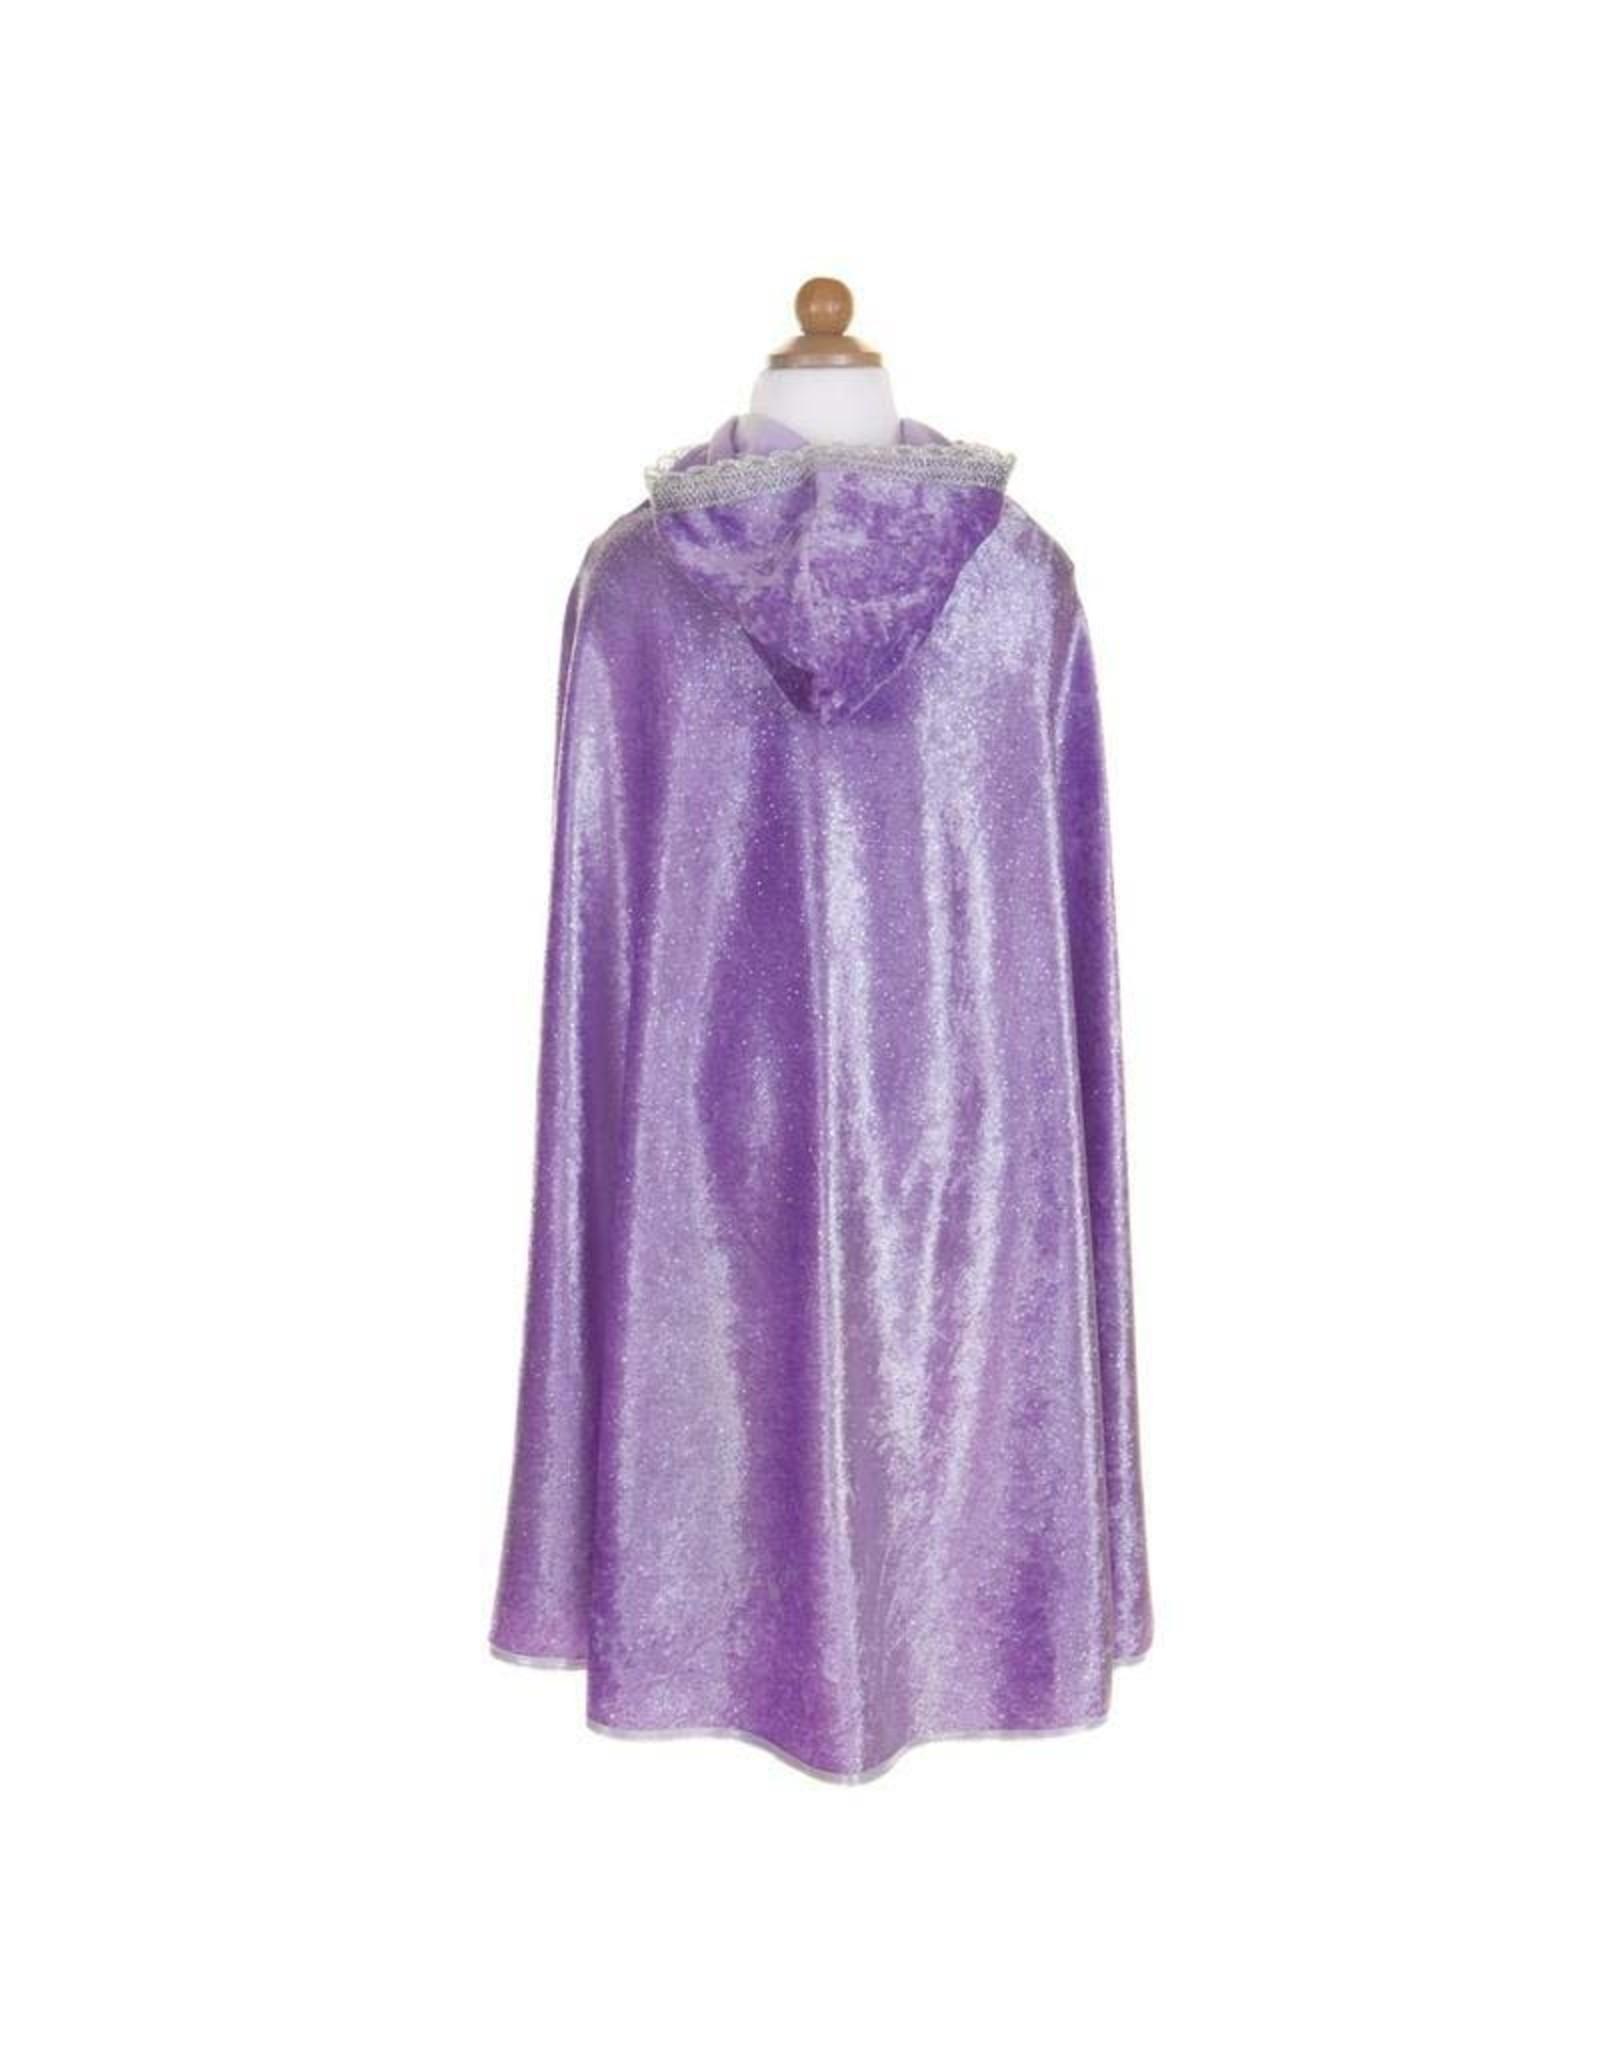 Great Pretenders Diamond Sparkle Cape Lilac md 5/6